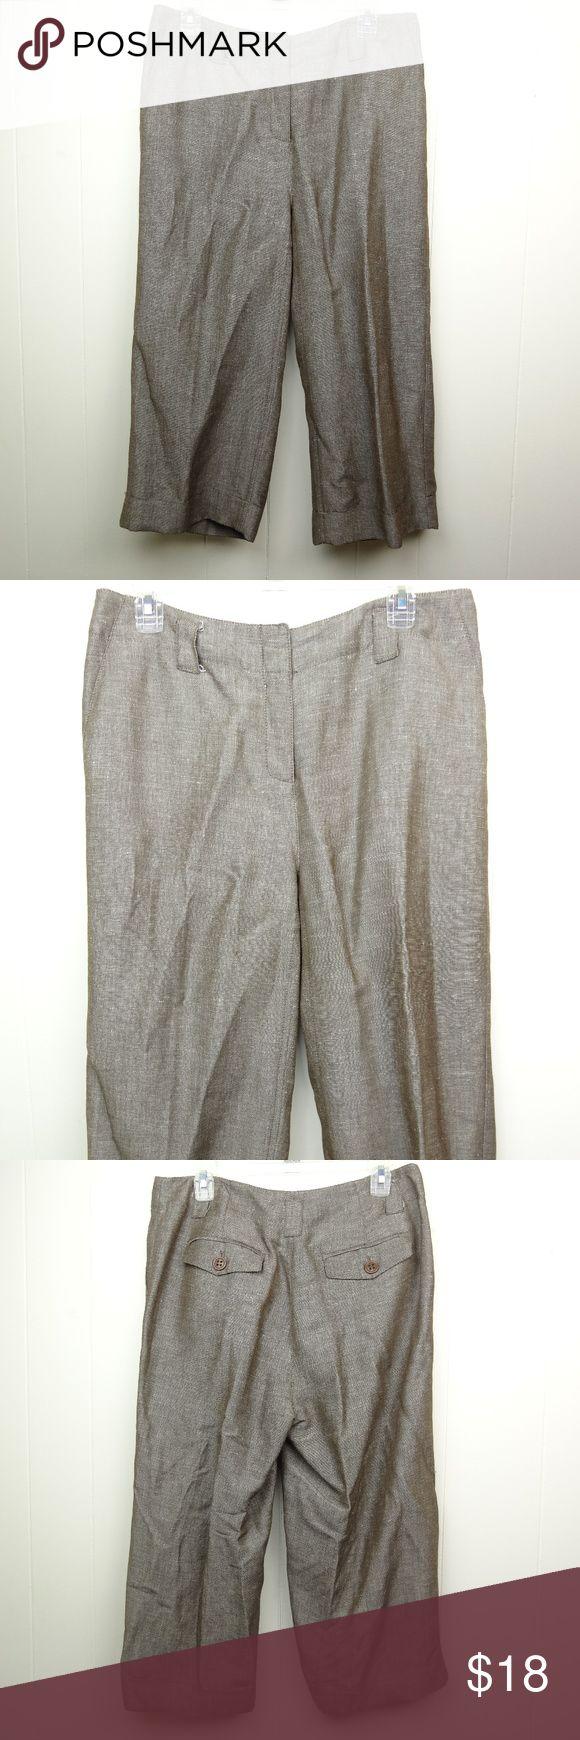 "Emma James Capris Cropped Pants Brown Fleck Linen Emma James linen blend capri pants. 55% linen, 45% rayon Women's Size PETITE 12 Waist laying flat 16.5"" Rise 10.5"" Inseam 20.5""  Good condition, light general wear. Pants Capris"